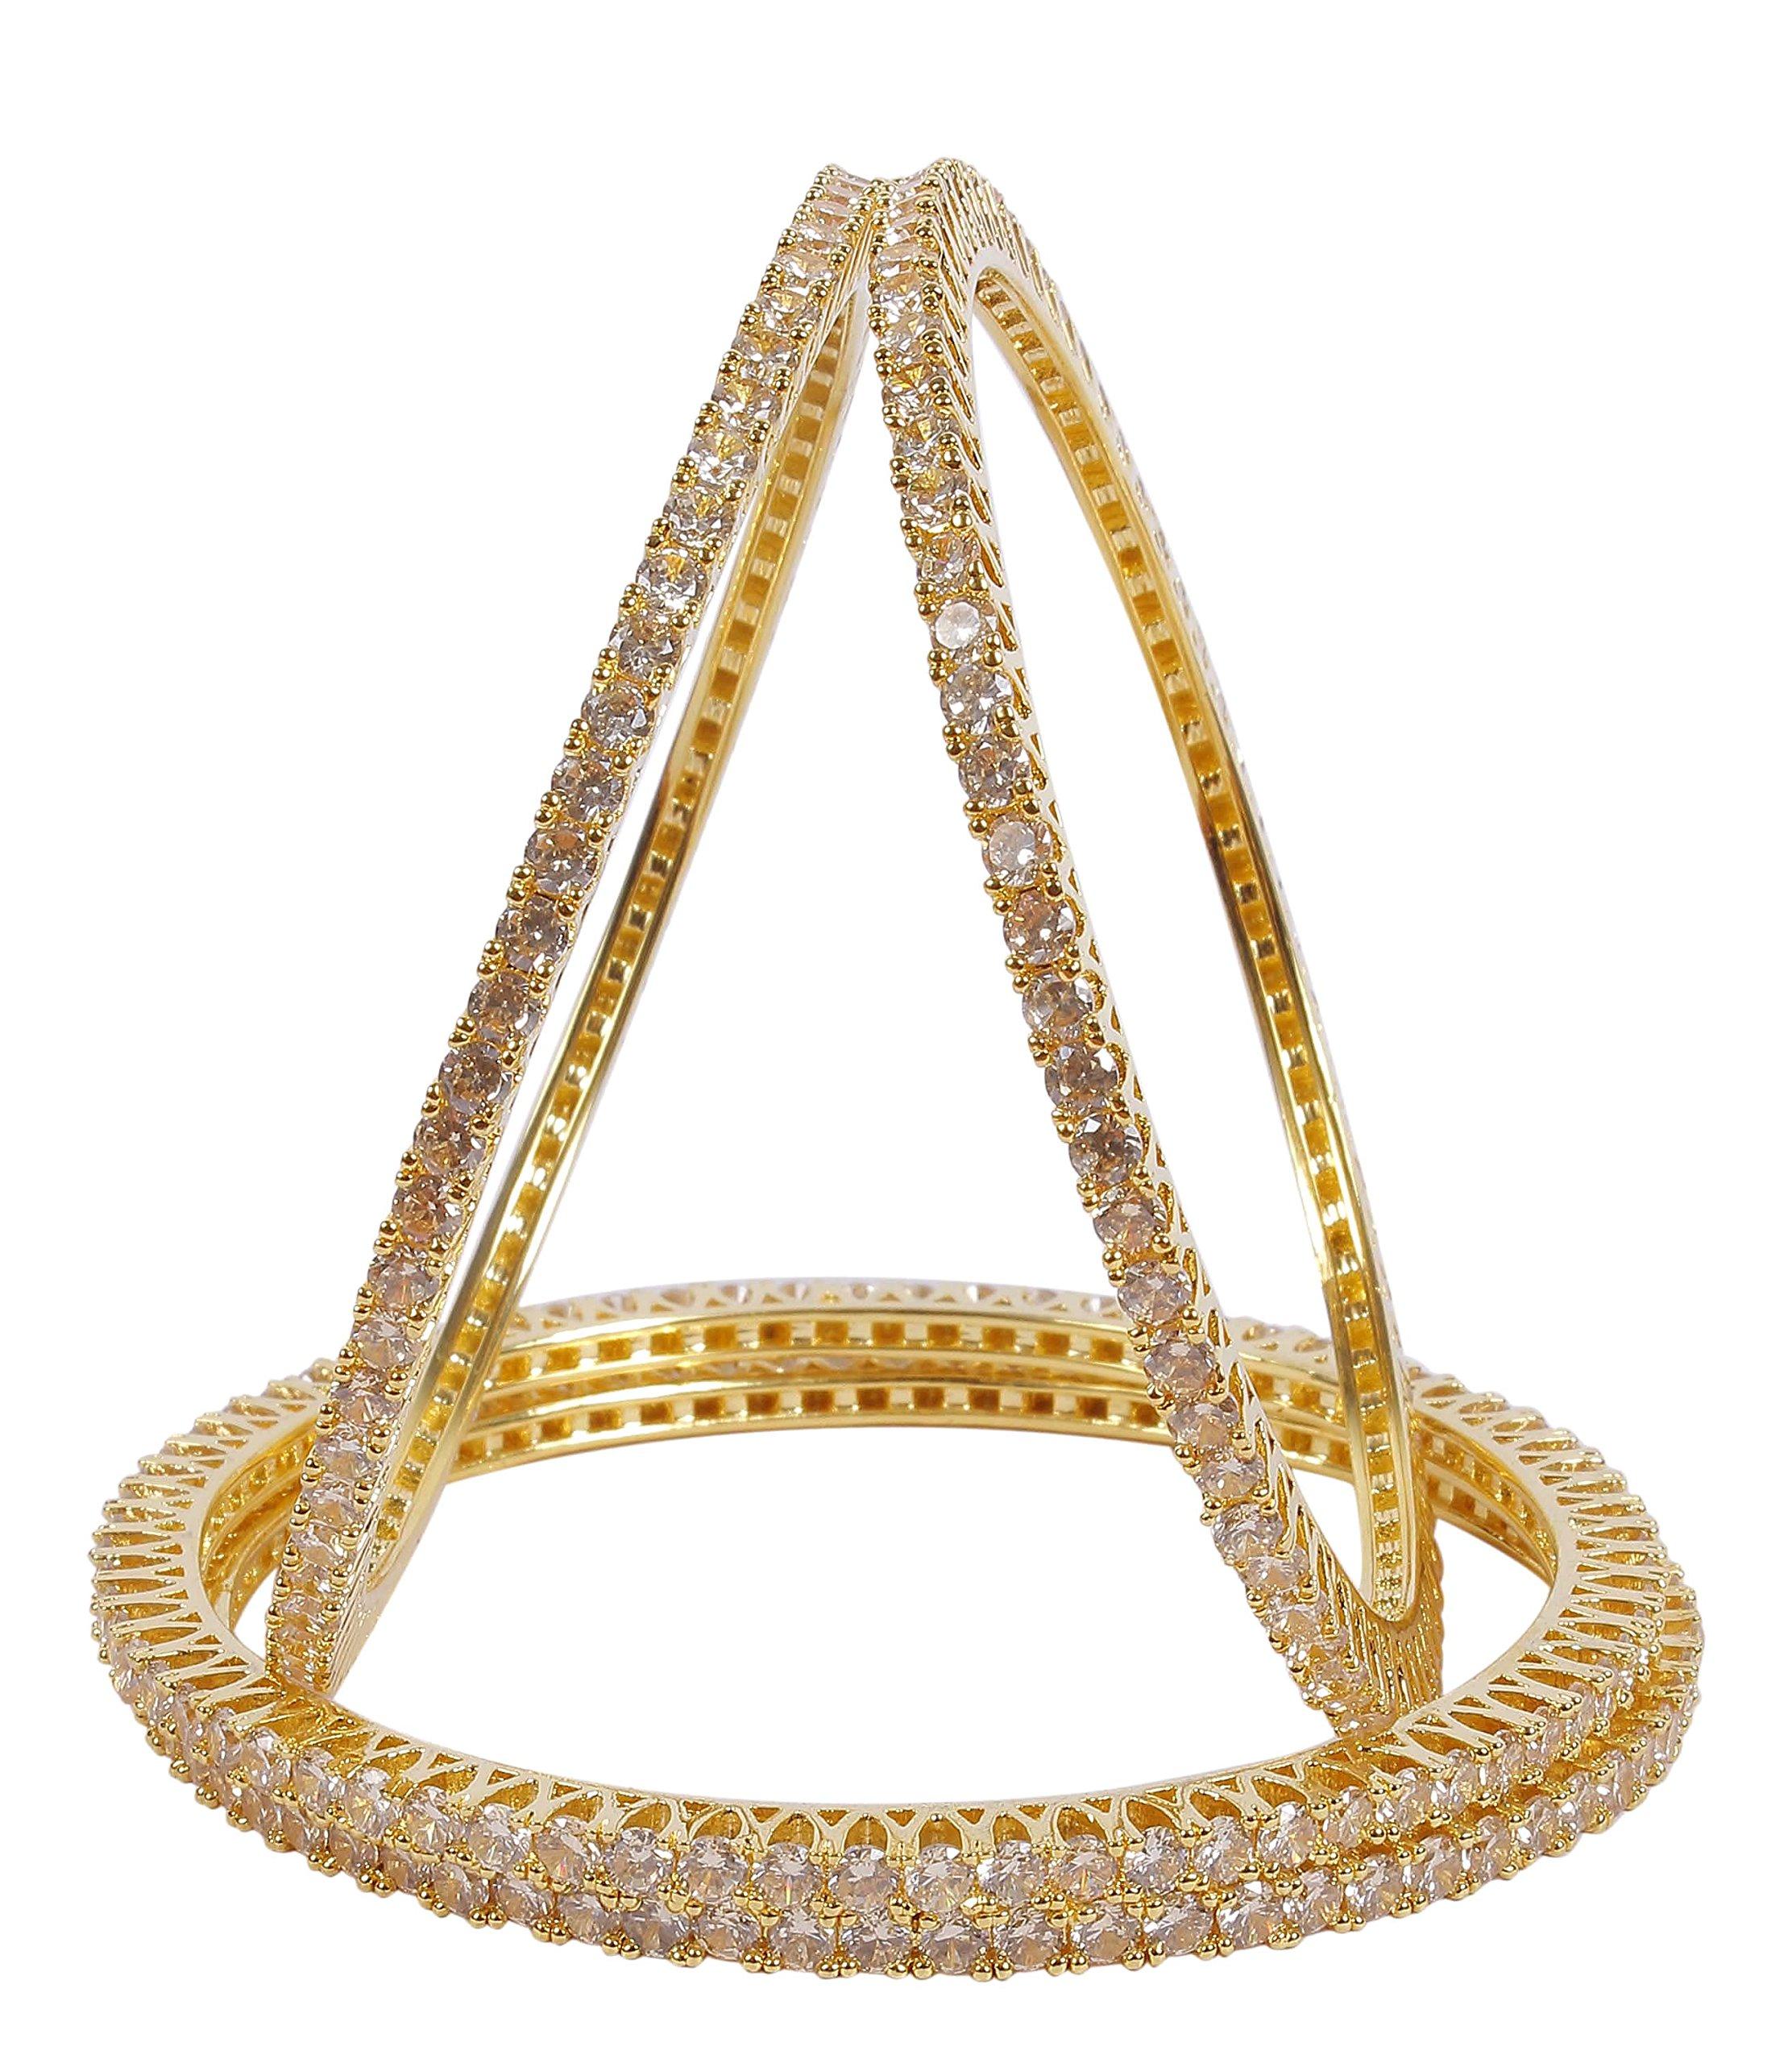 MUCHMORE Bollywood Gorgeous Style Gold Tone Diamond Swarovski Elements Indian Bangles Traditional Jewelry (2.6)